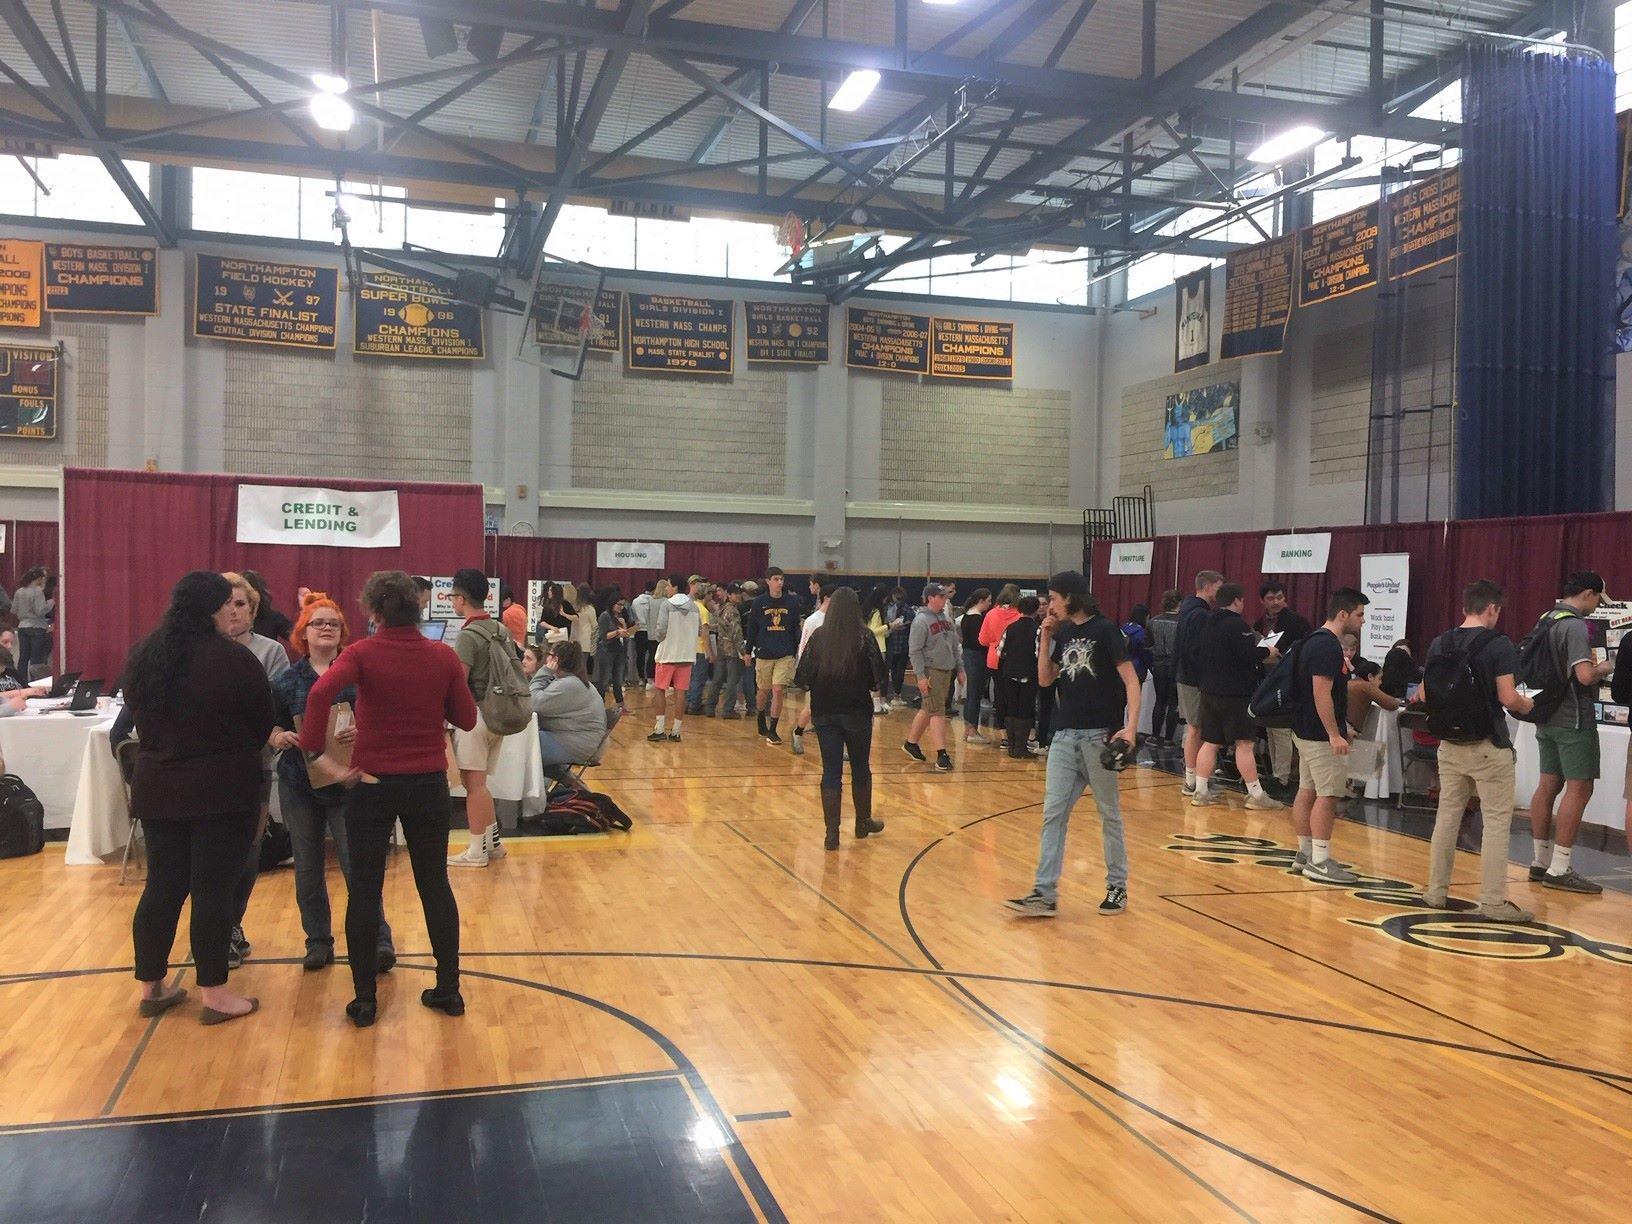 Busy Teen Reality Fair in High School gym